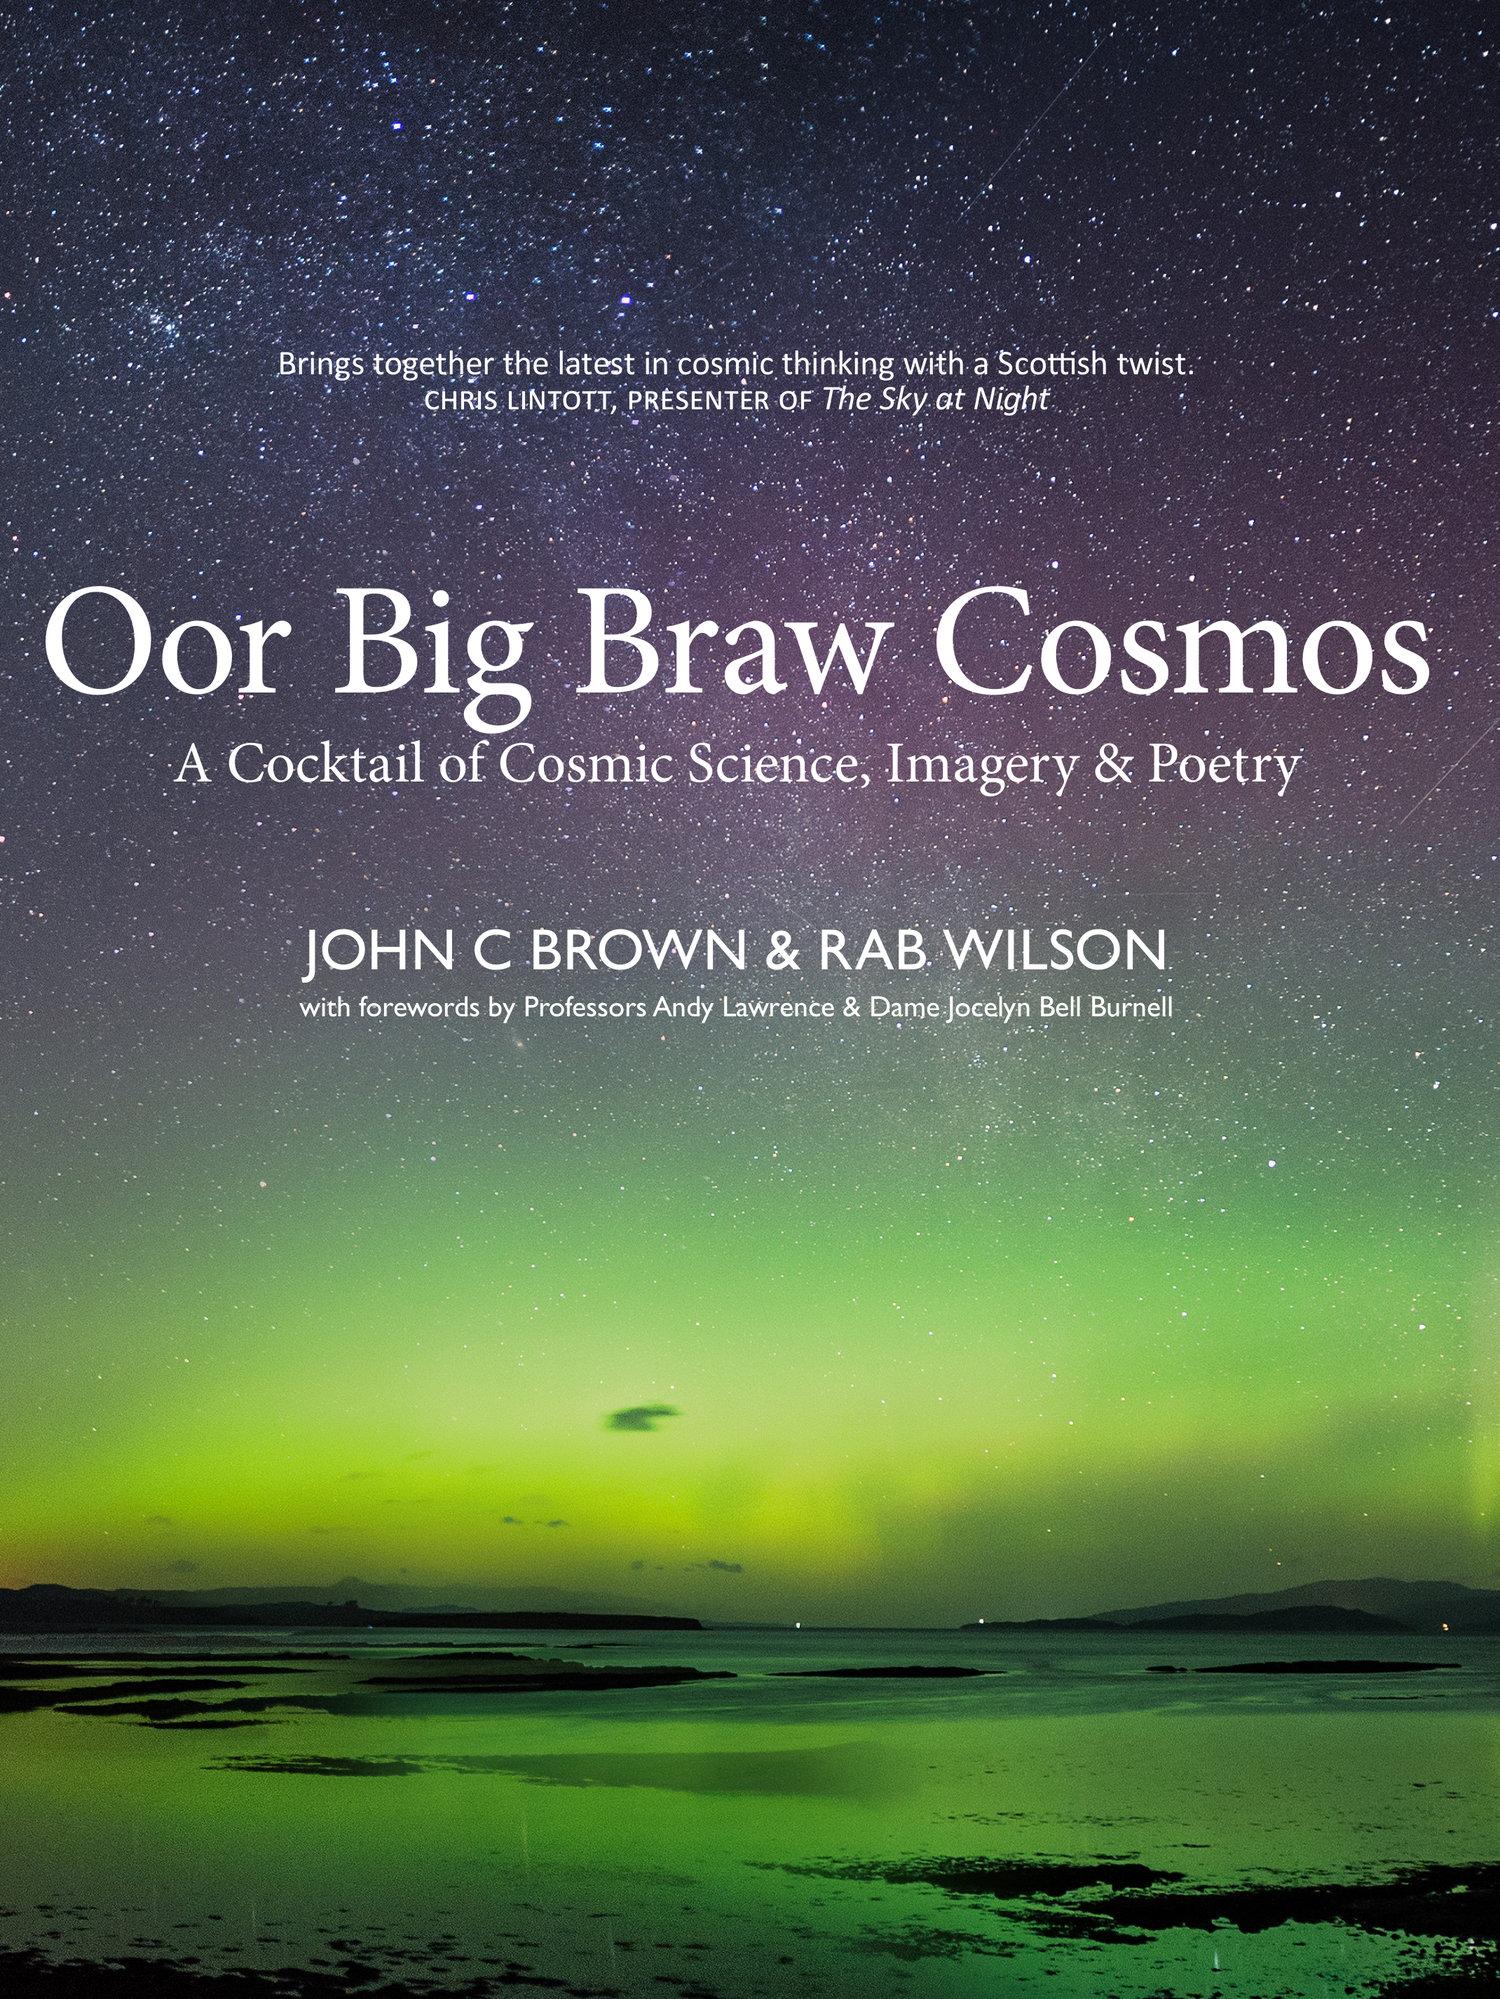 Oor+Big+Braw+Cosmos+John+C+Brown+Rab+Wilson+Luath+Press+9781913025052.jpg